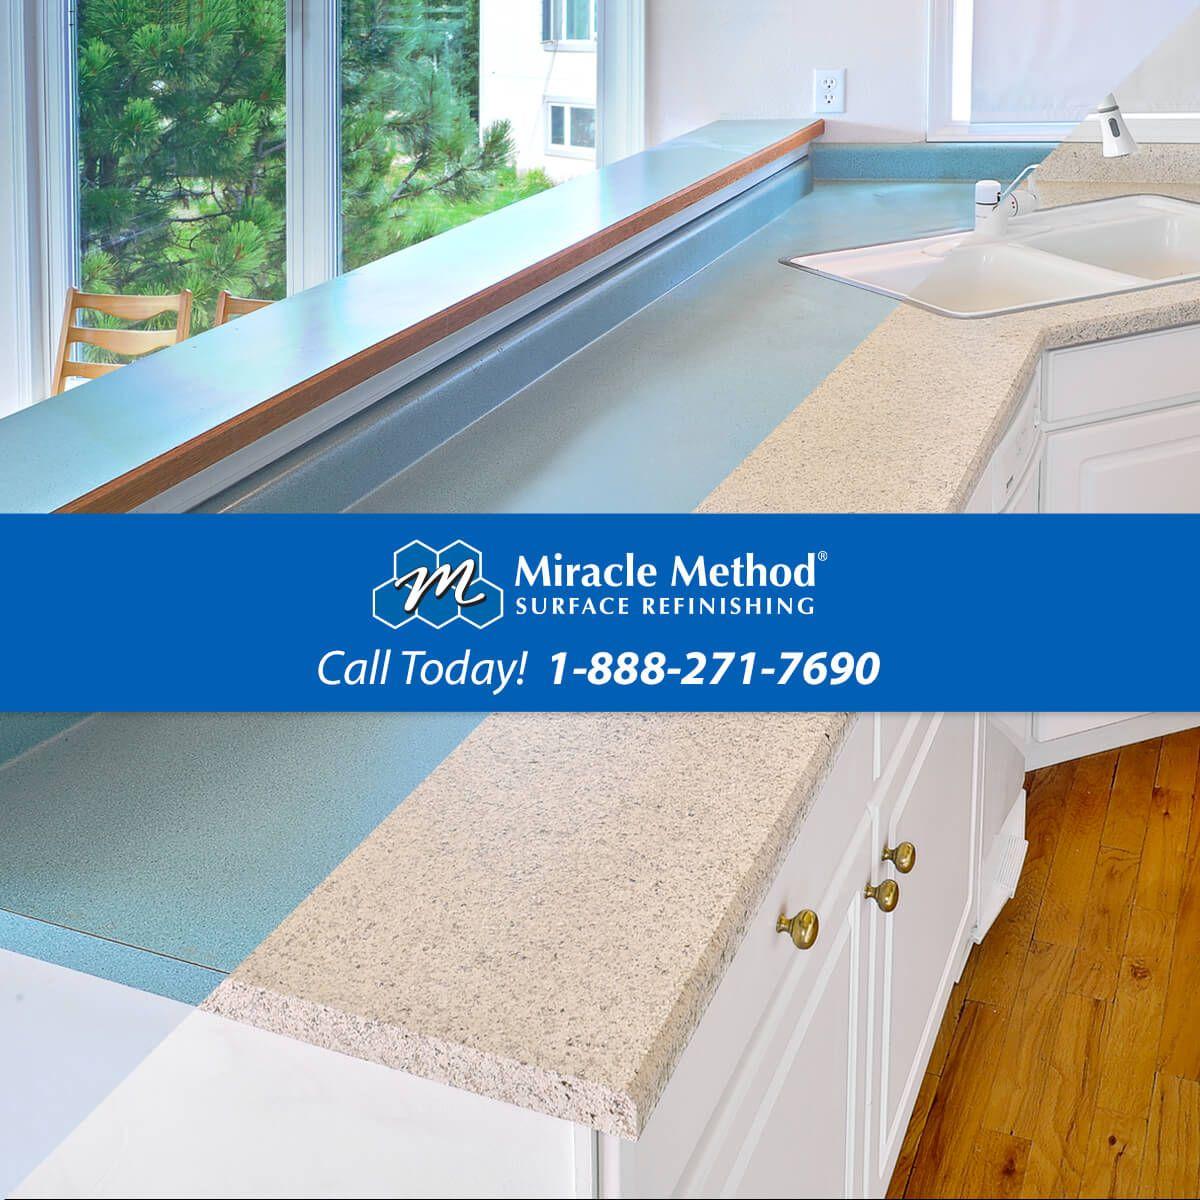 Bathtub Resurfacing Countertop Bathroom Tub And Tile Refinishing - Ceramic tile refinishing products